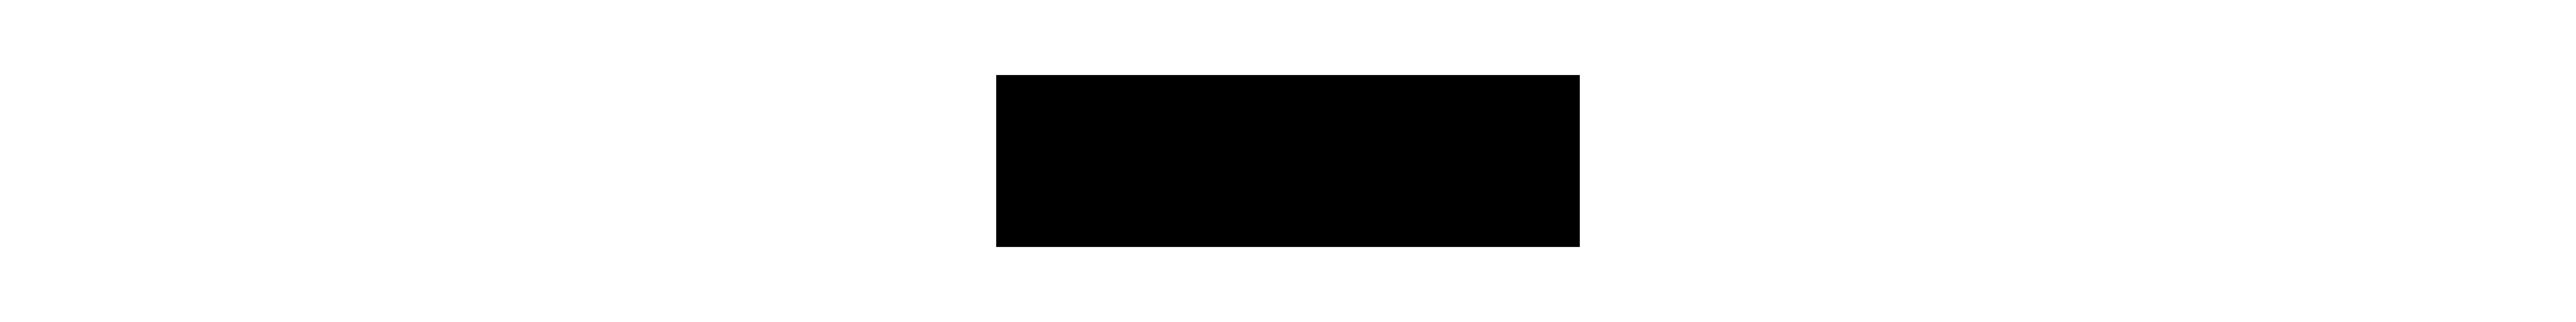 Extension_Black-newsletter